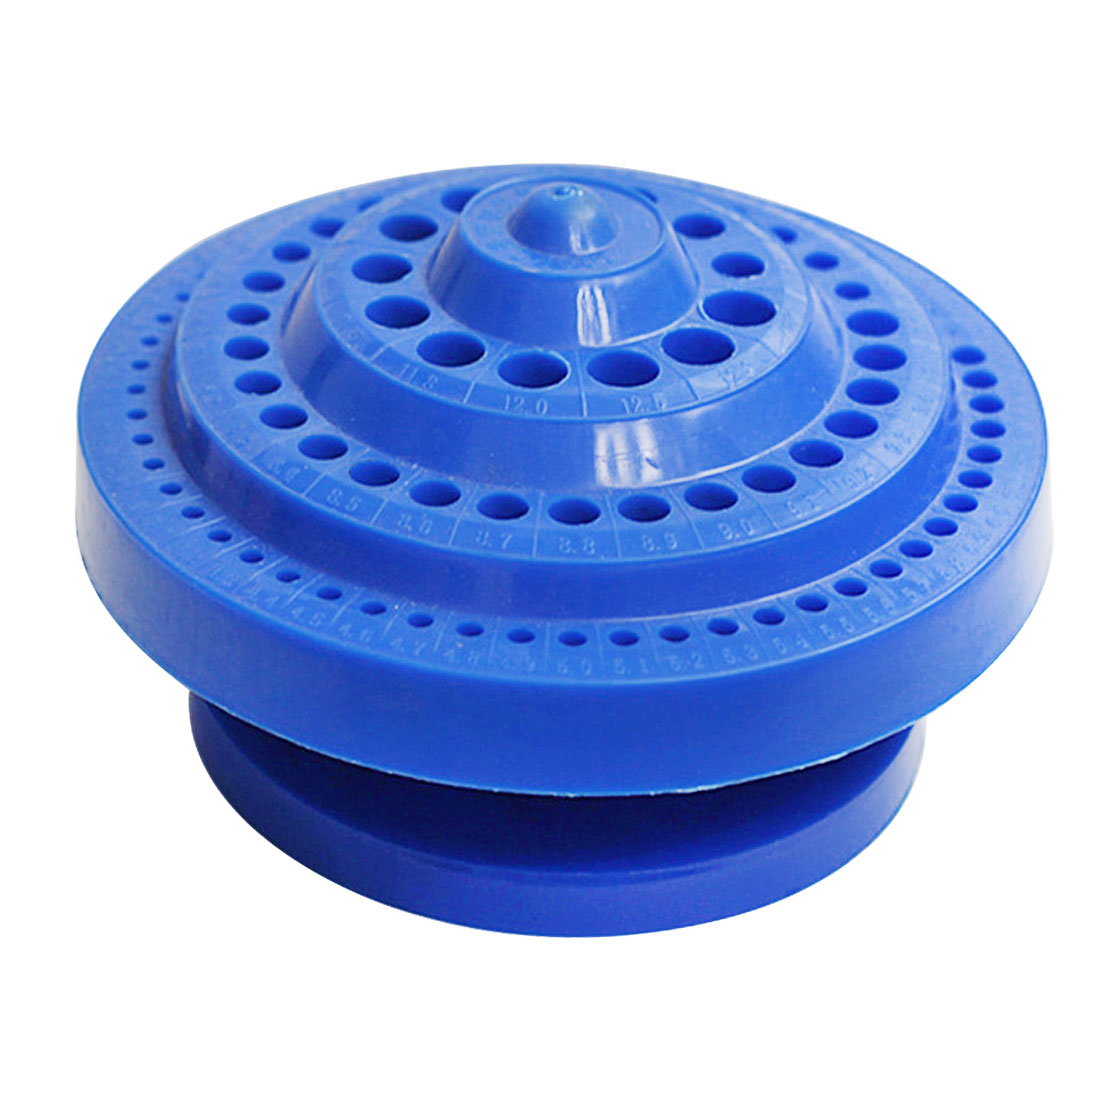 New 1pcs Round Shape Plastic Hard 100pcs 1-13mm Drill Bit Storage Case Blue